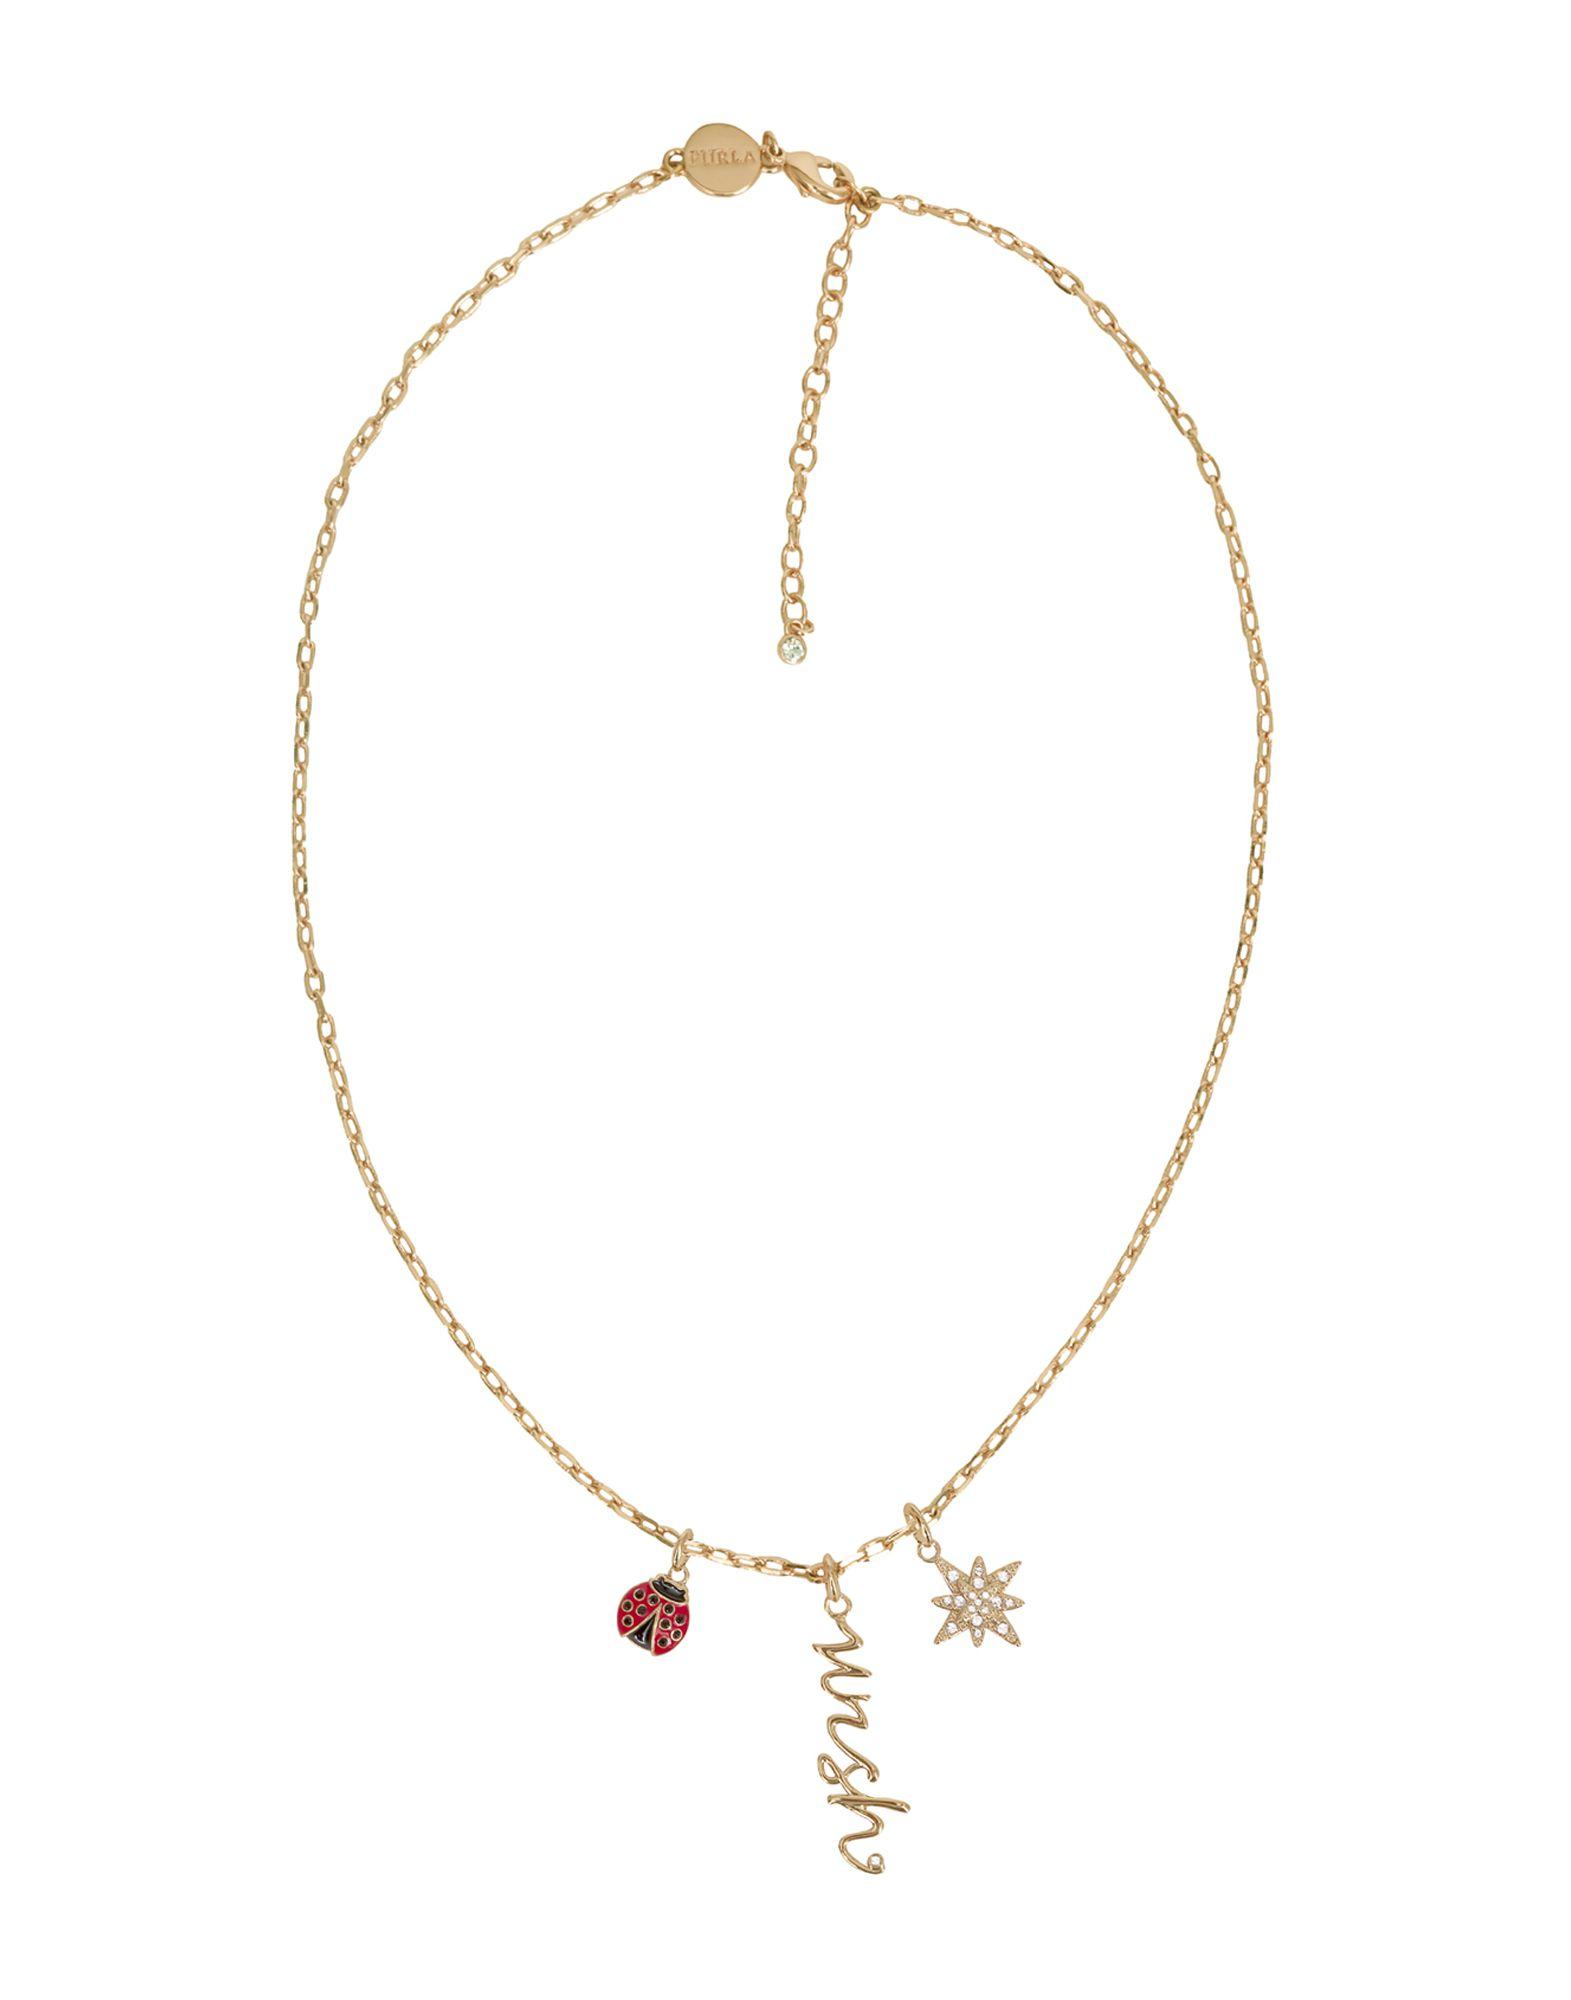 FURLA Necklaces. logo, crystals, adjustable hook and chain fastening. 65% Metal, 30% Swarovski crystal, 5% Enamel